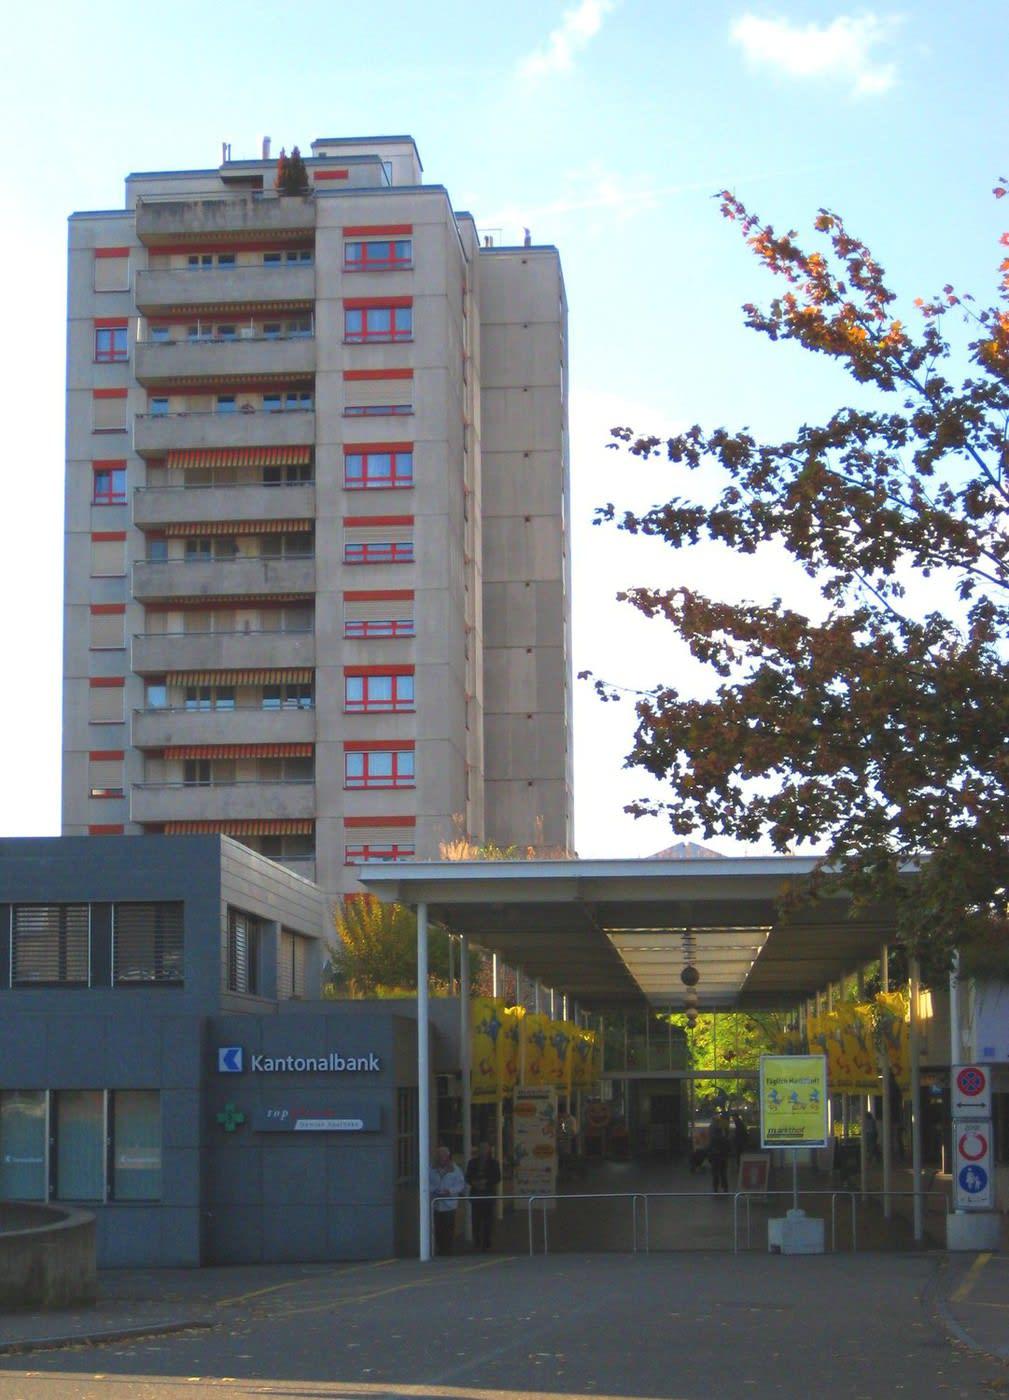 Schulstrasse 3